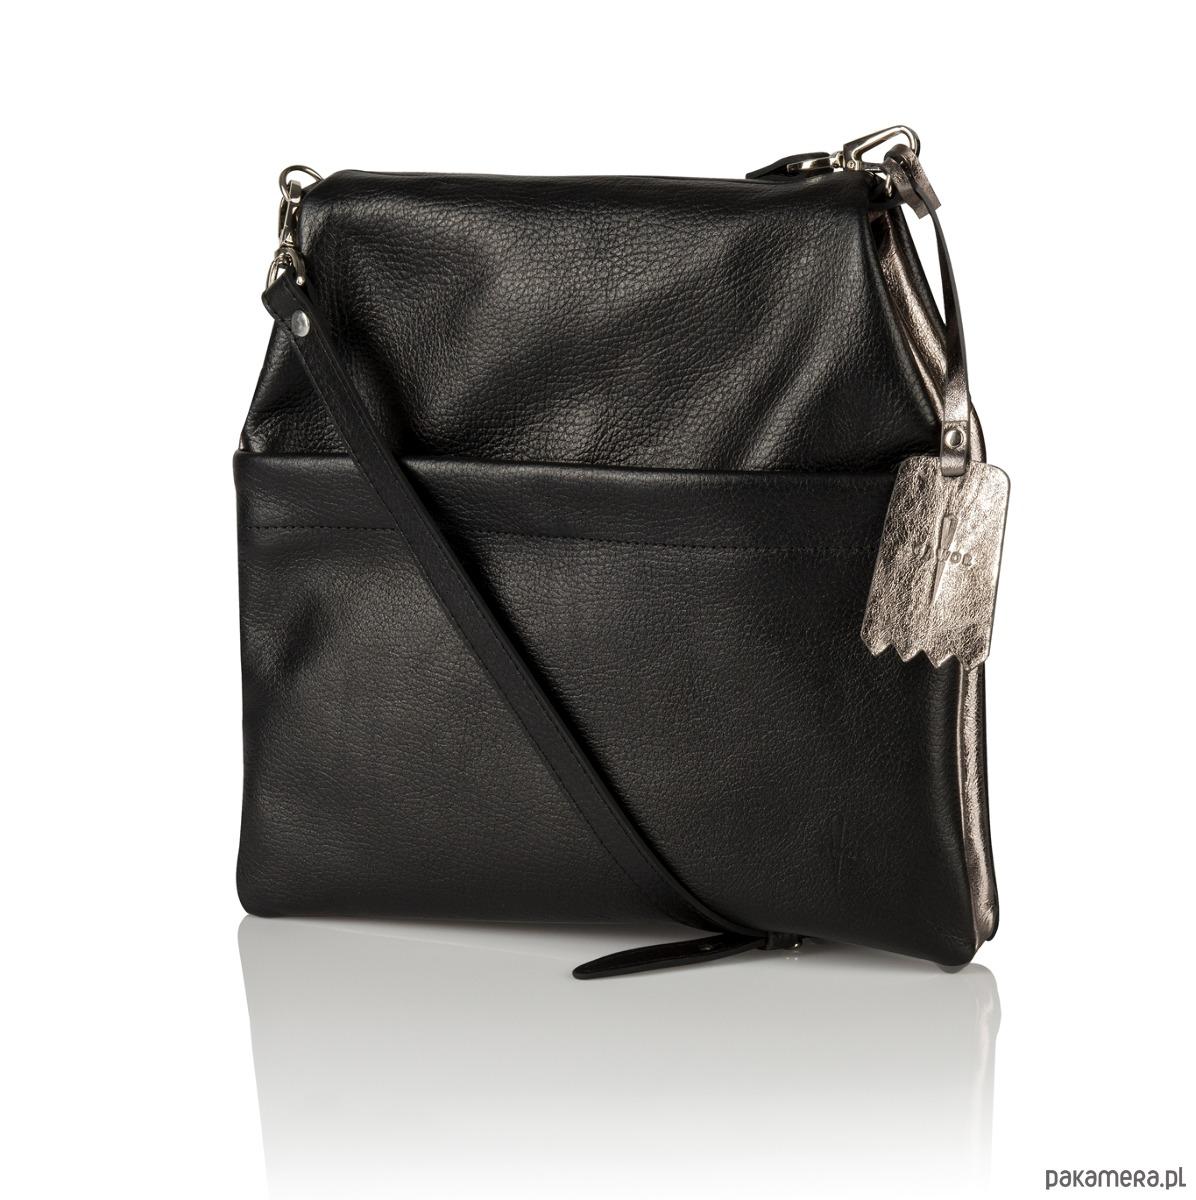 d6d4ae2591088 Skórzana dwustronna torebka listonoszka czarna - torby na ramię ...